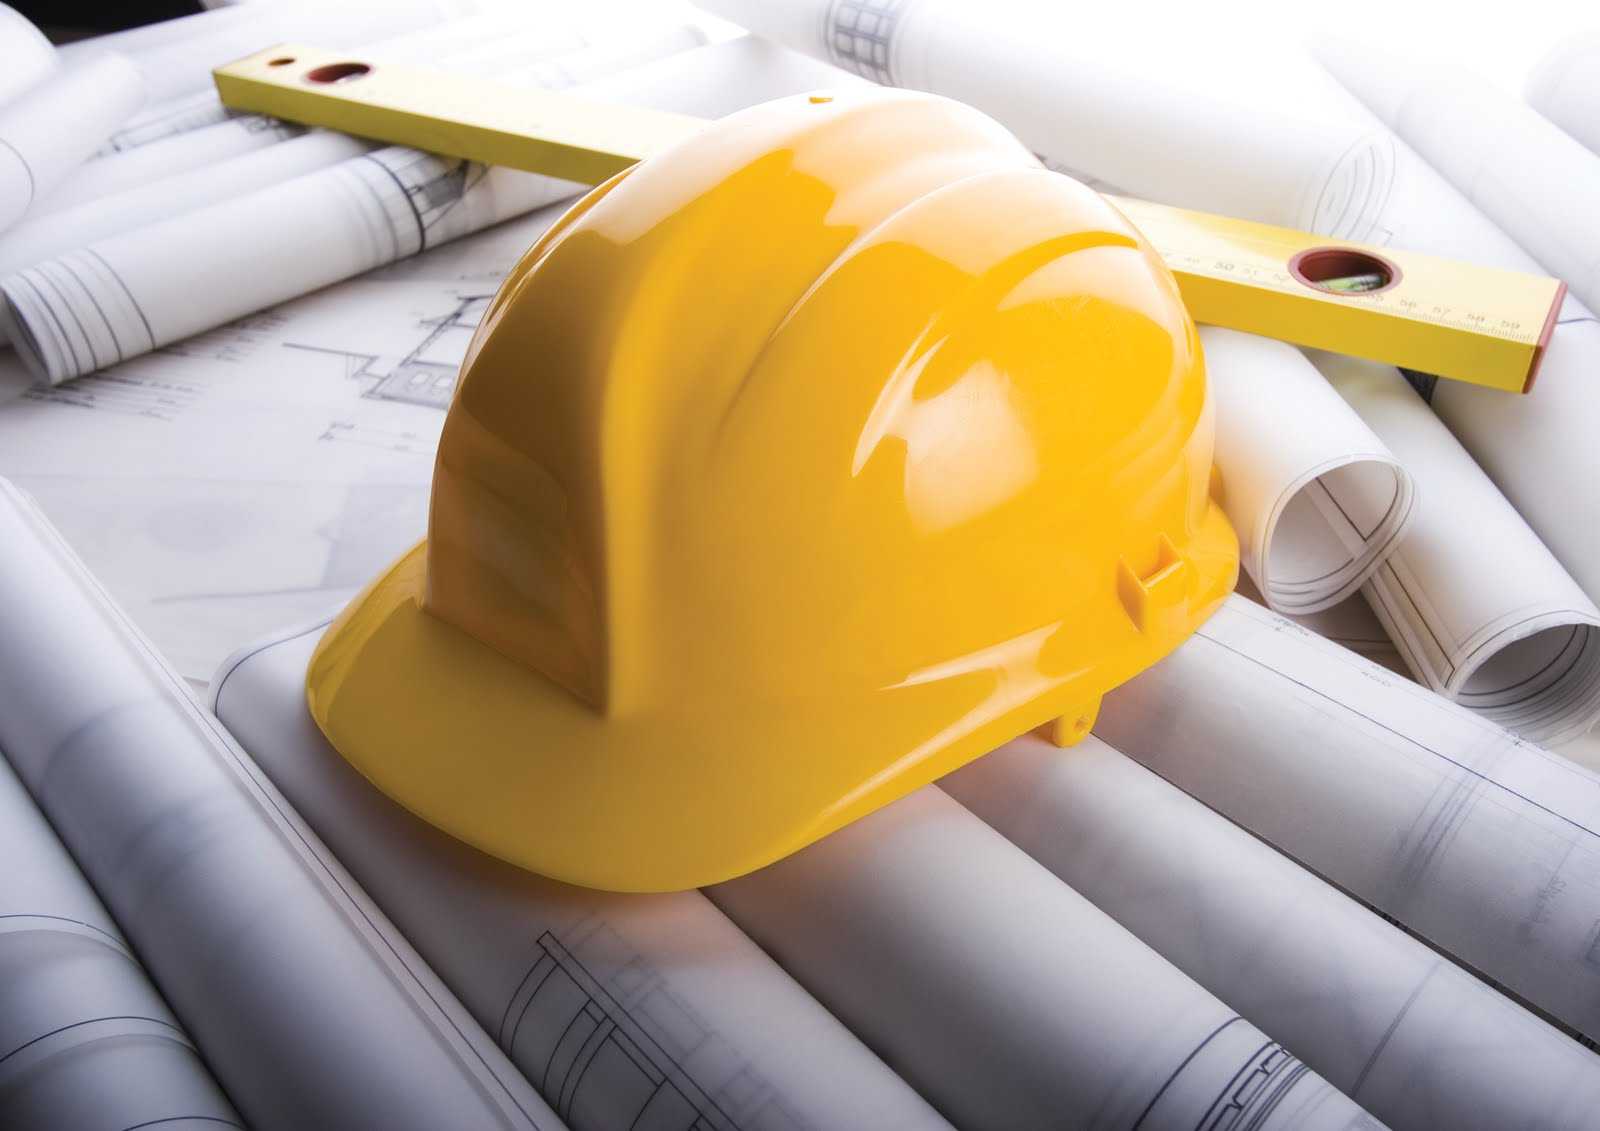 construção-civil.jpg